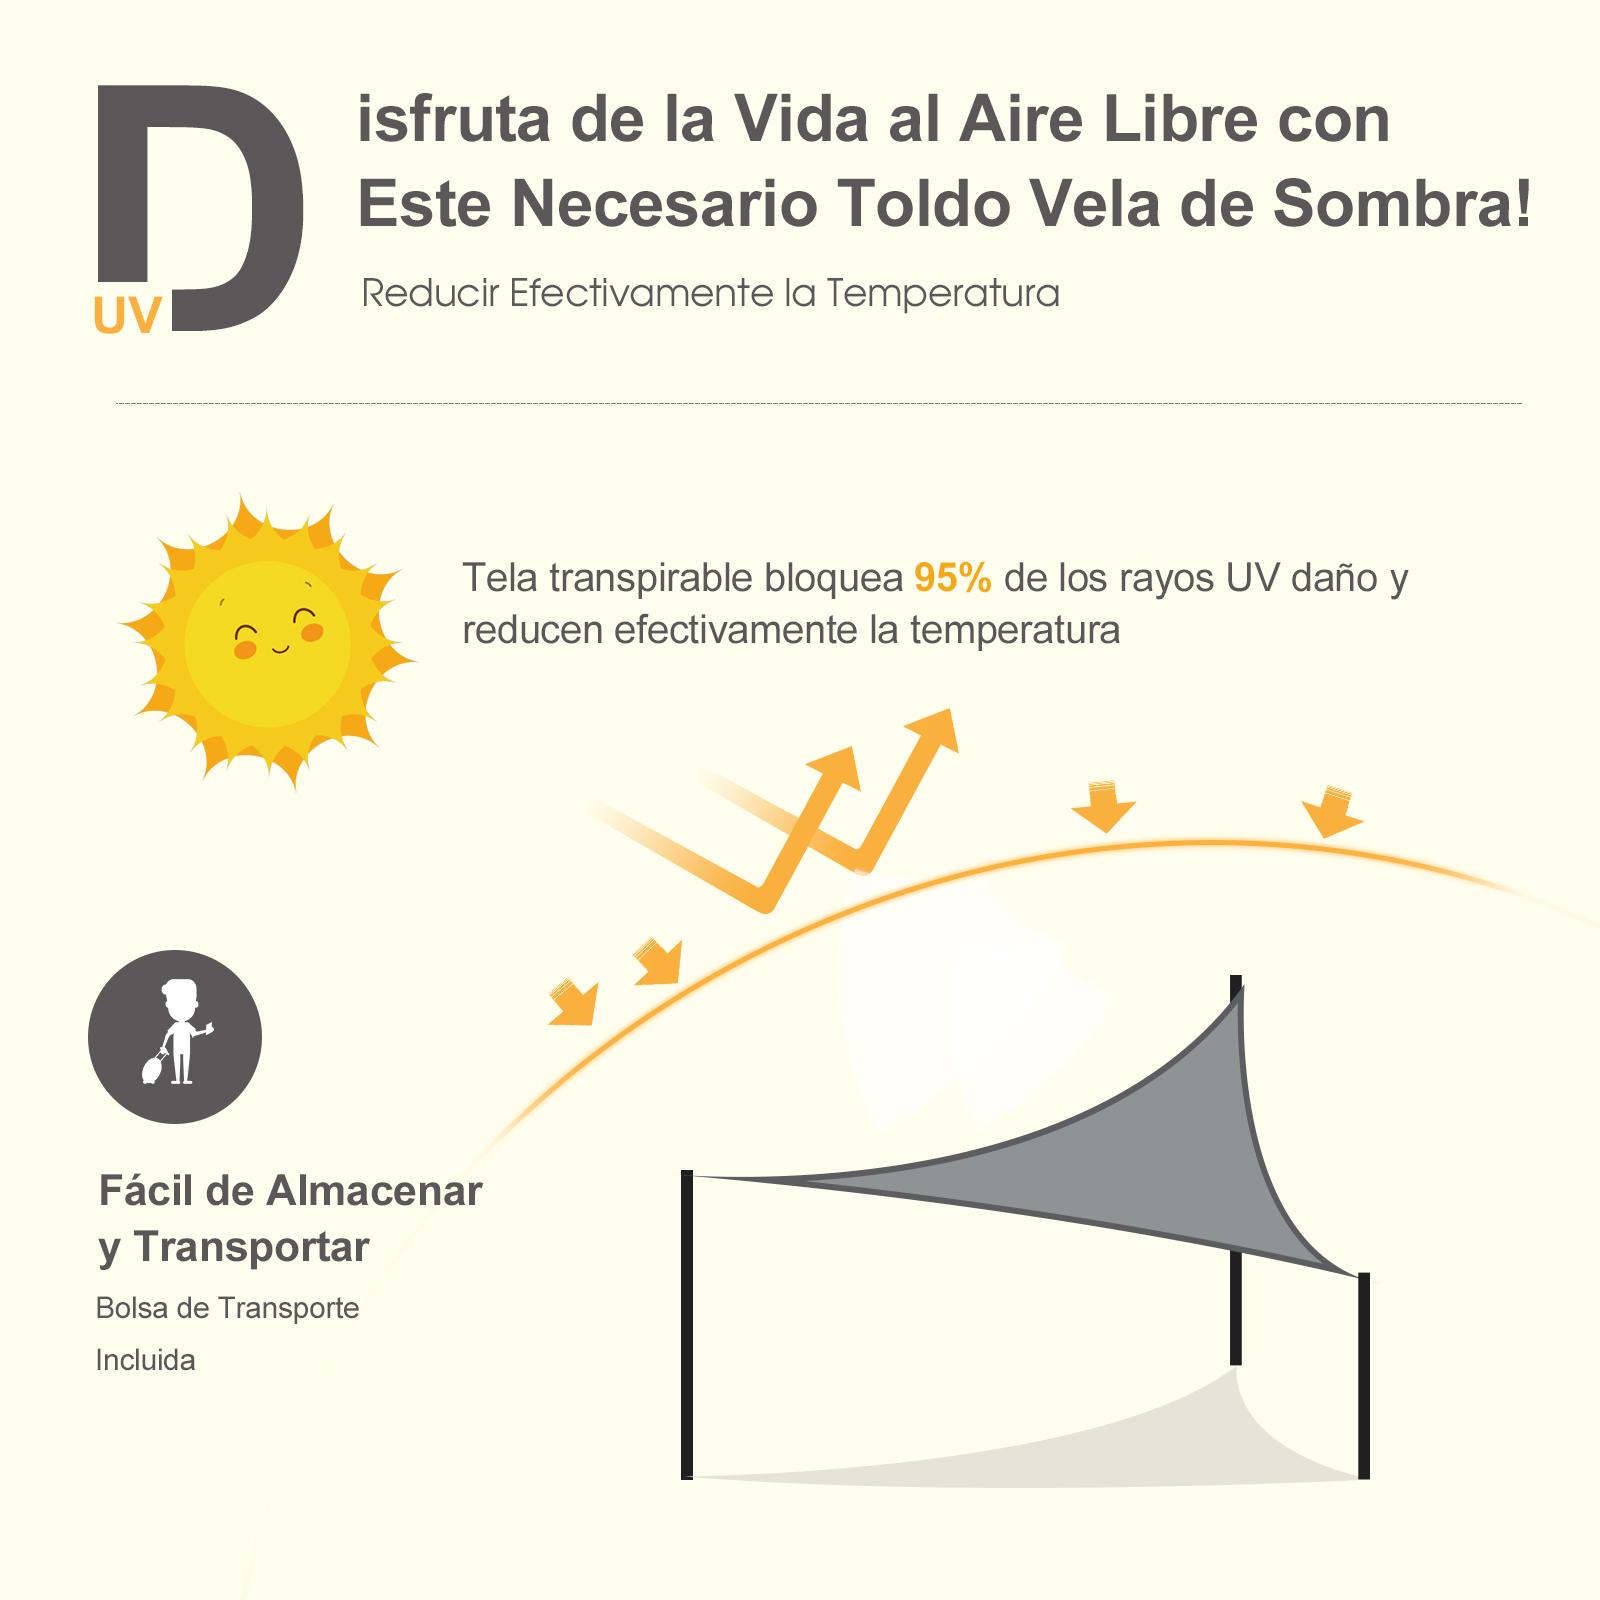 Toldo-Vela-Sombrilla-Parasol-Triangulo-Tejido-de-Poliester-185-g-m-Jardin-Playa miniatura 19